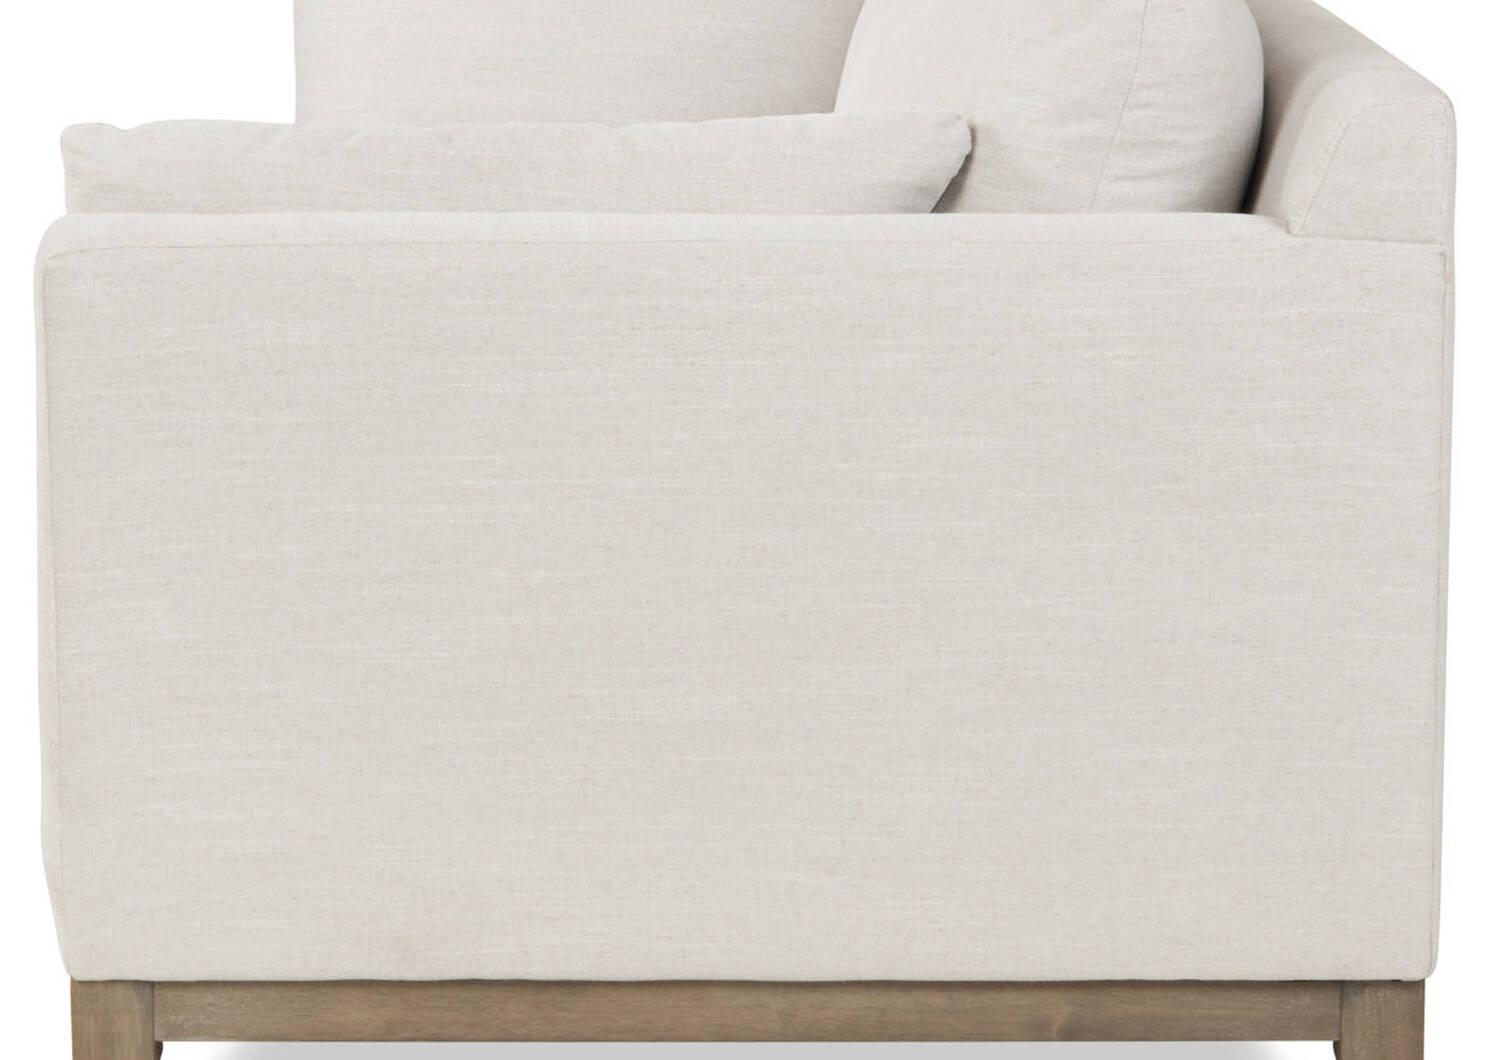 Ryerson Sofa -Aros Dove